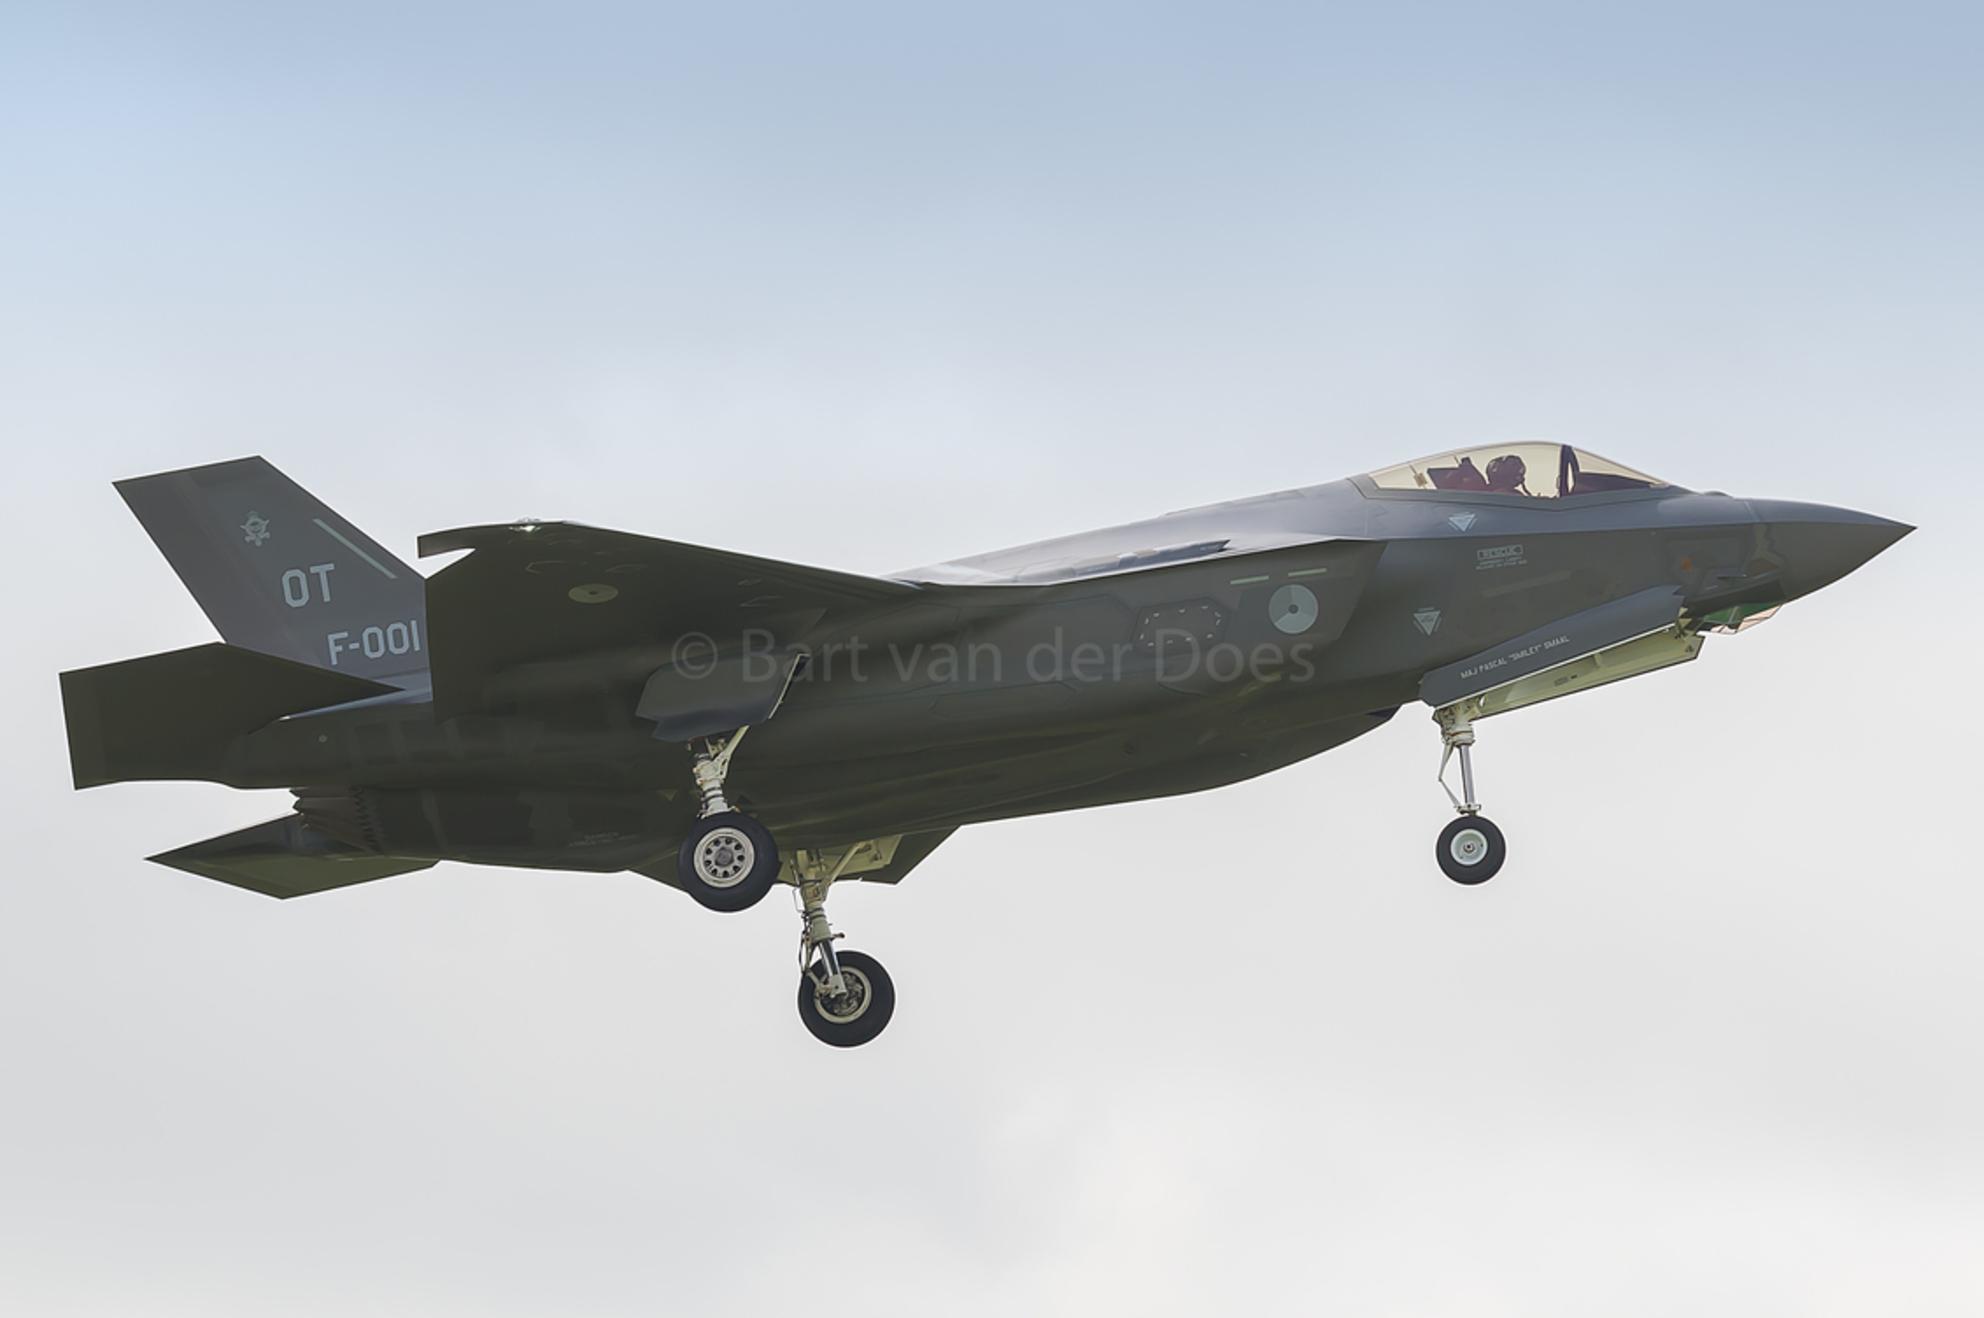 F-35A - F-001 323 SQN 'OT' - F-35A - F-001 323 SQN 'OT' - foto door BirdieBarty op 14-07-2017 - deze foto bevat: klu, vliegtuig, landing, nederland, scanner, afterburner, leeuwarden, piloot, volkel, airborne, vliegbasis, luchtmachtdagen, defensie, arrival, usaf, runway, qra, fwit, Frisian Flag, f-35, f35, edwards air base, f-001, f-002, f-35a - Deze foto mag gebruikt worden in een Zoom.nl publicatie